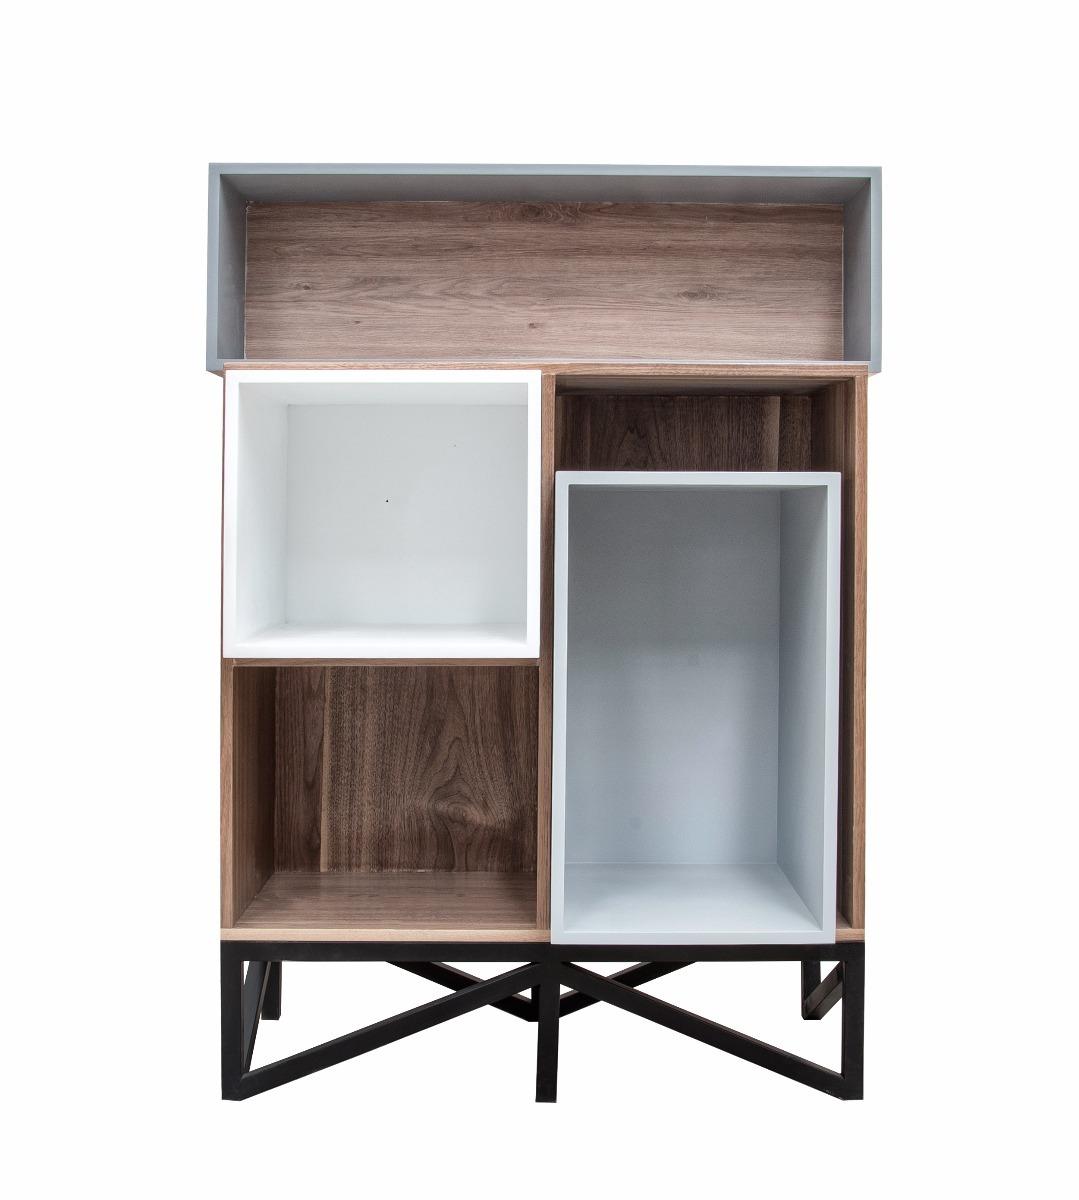 Moderno Librero Juguetero Bufetera Vitrina Exhibidor  # Muebles Bufeteros Modernos